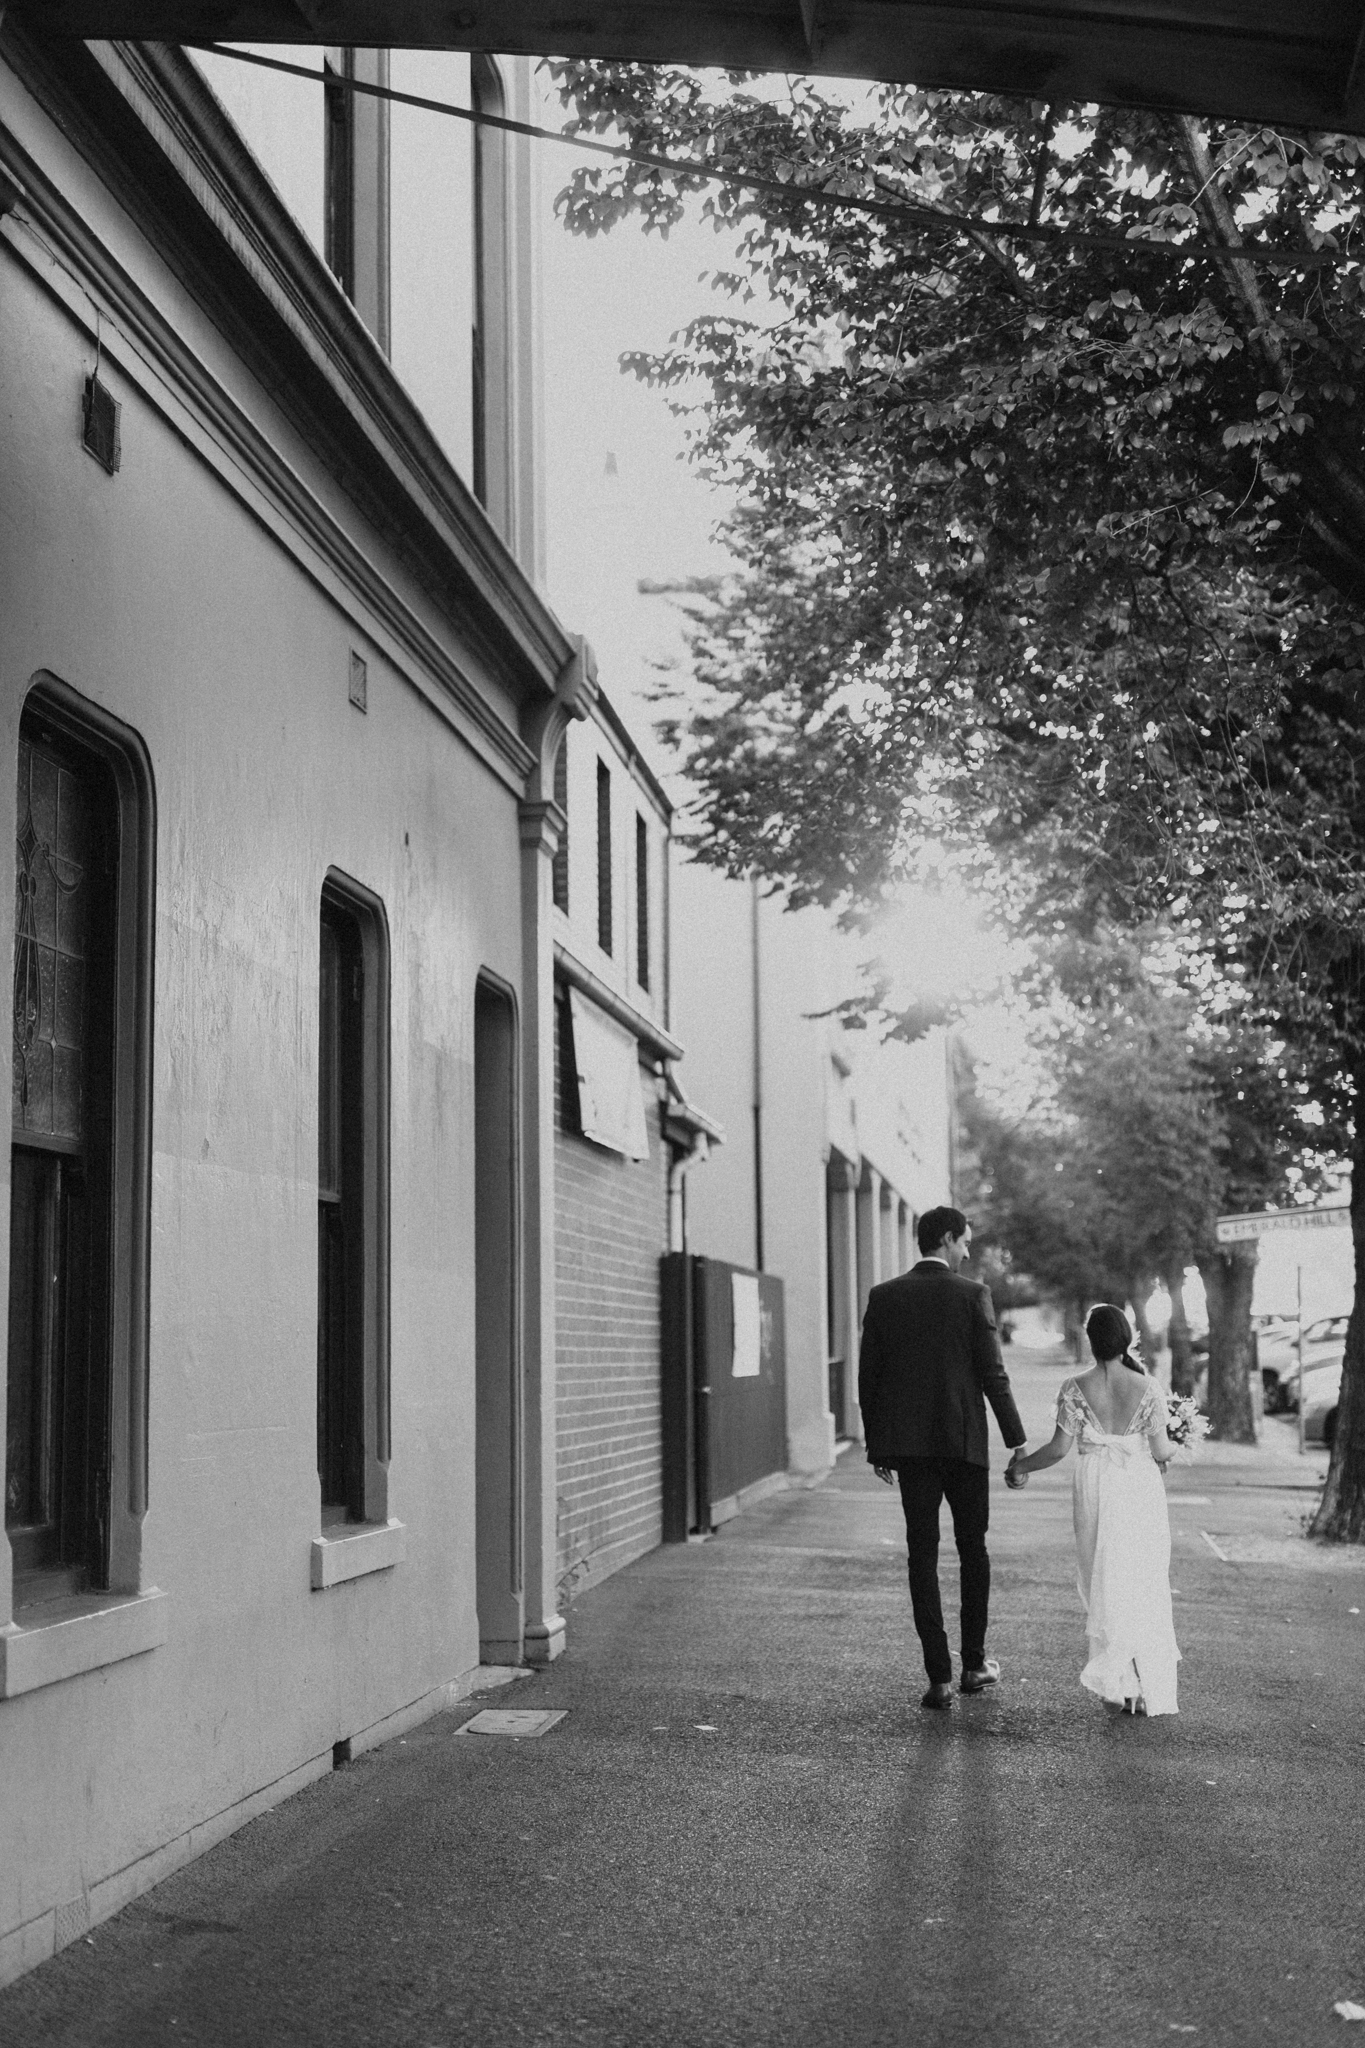 St-Ali-Wedding-Emotions-and-Math-Photography-051.jpg